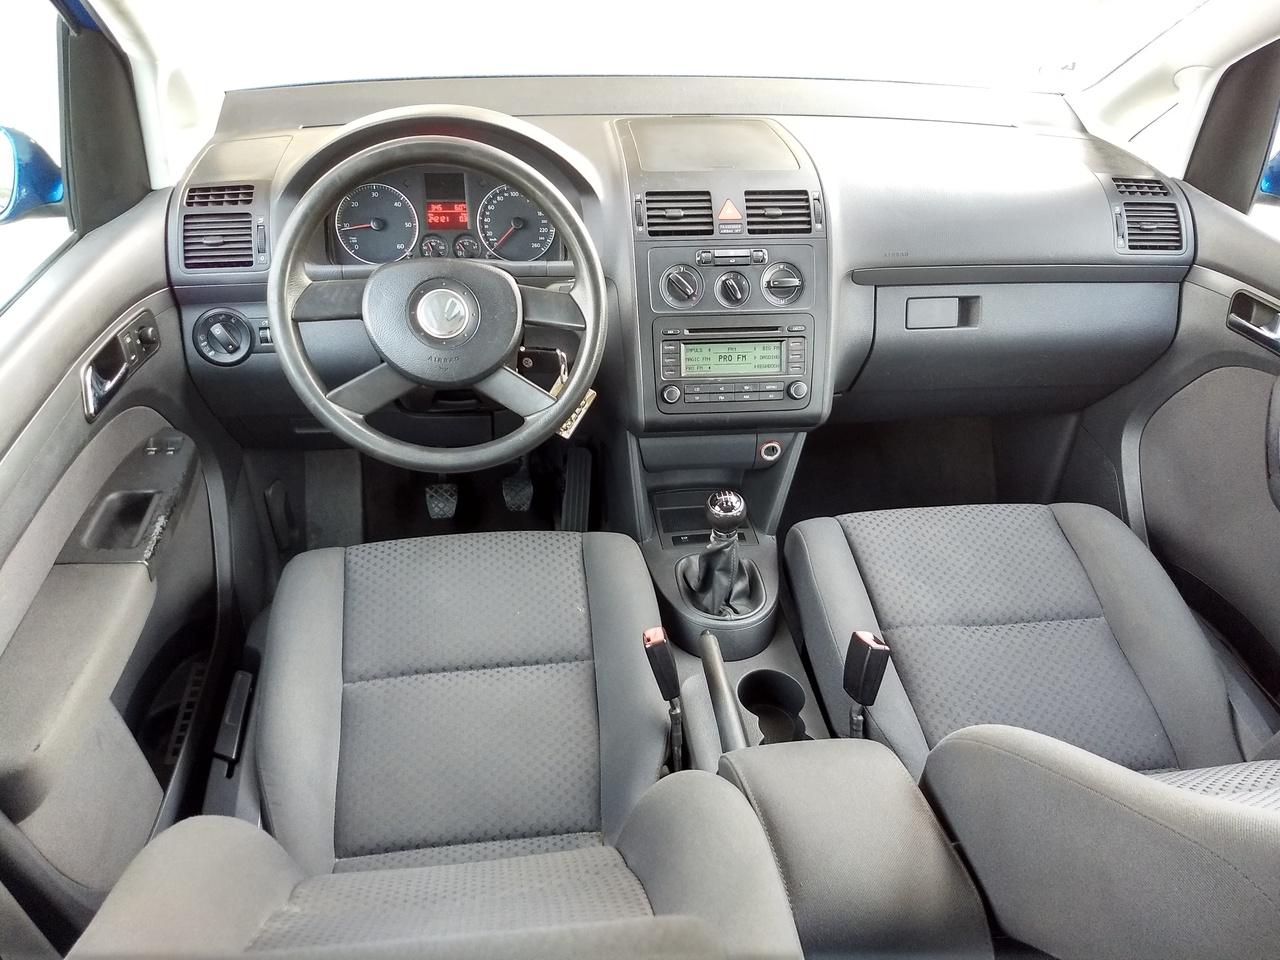 VW Touran 1.9 TDI 6+1 viteze 7 Locuri 2005